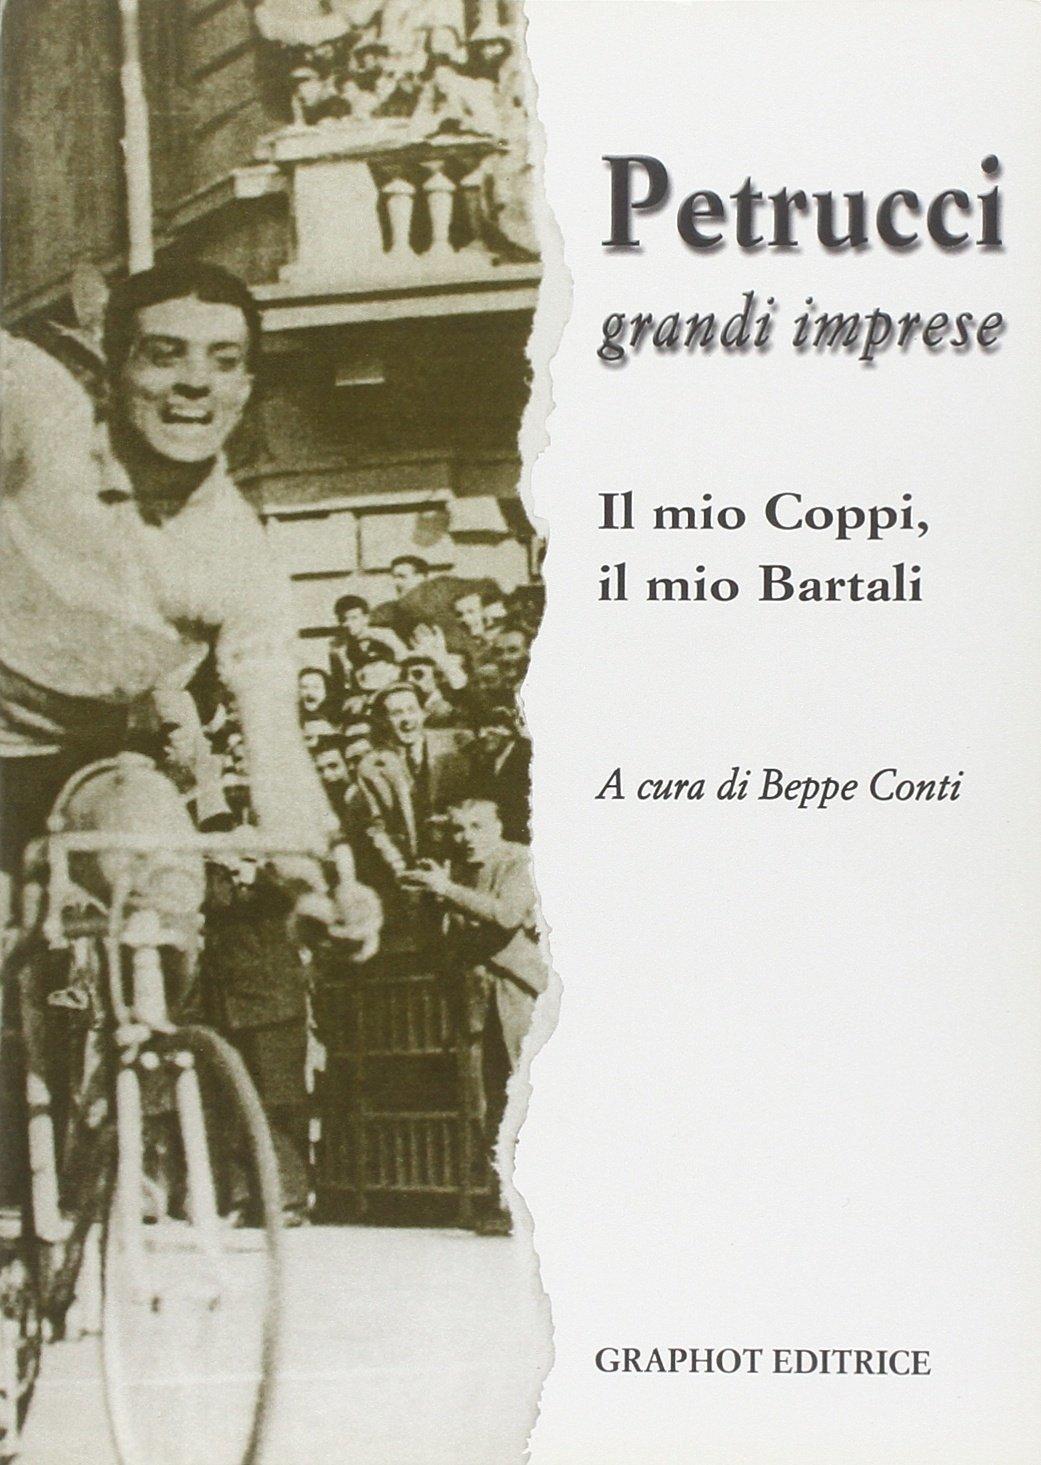 Beppe Conti - Petrucci grandi imprese